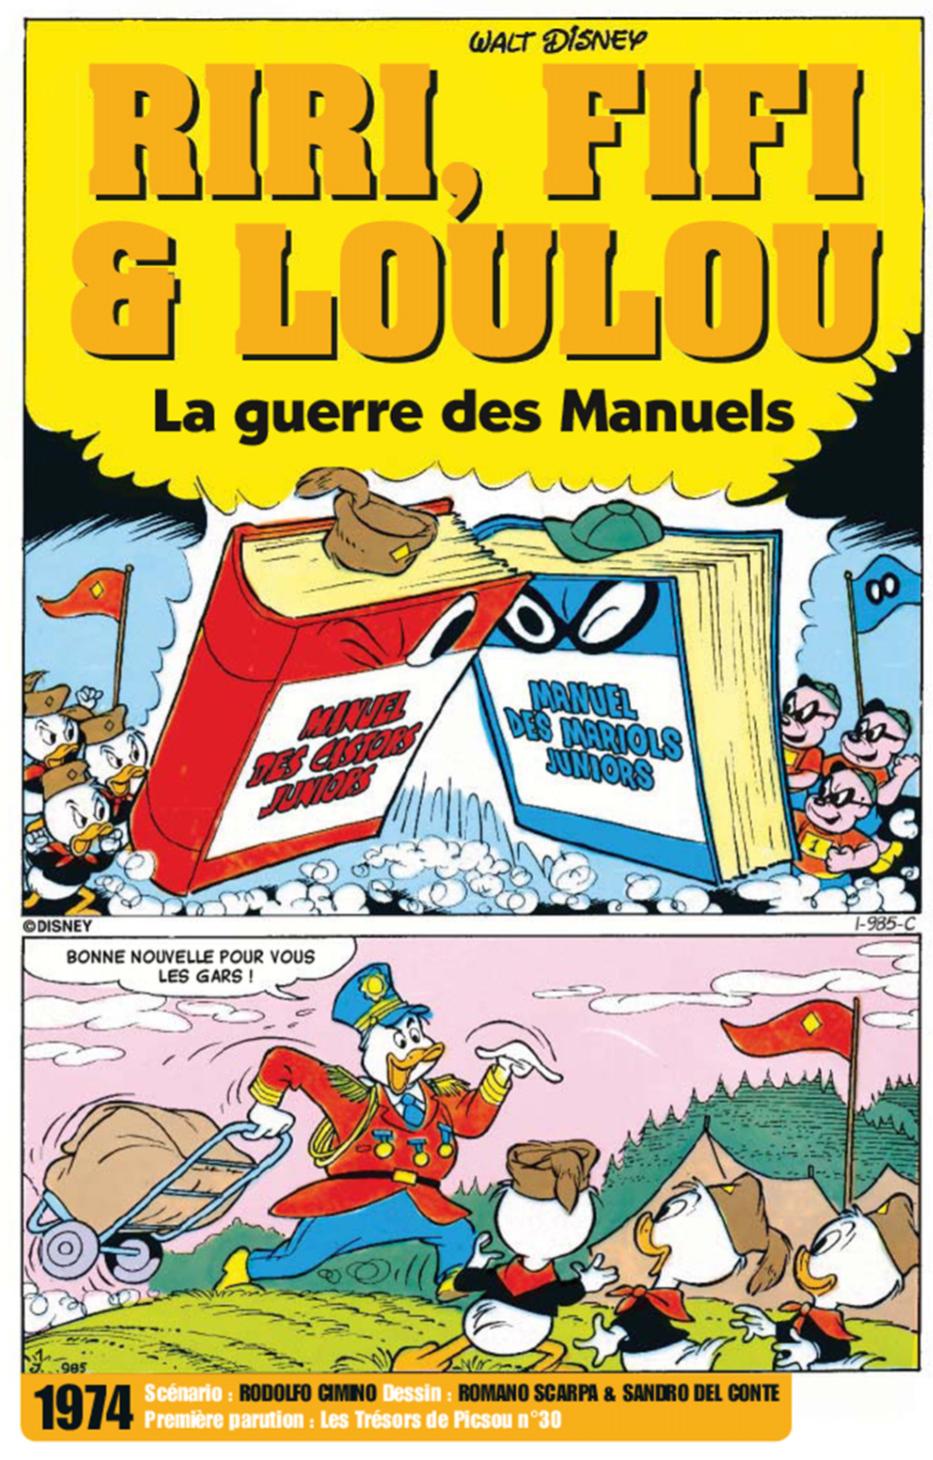 La guerre des Manuels